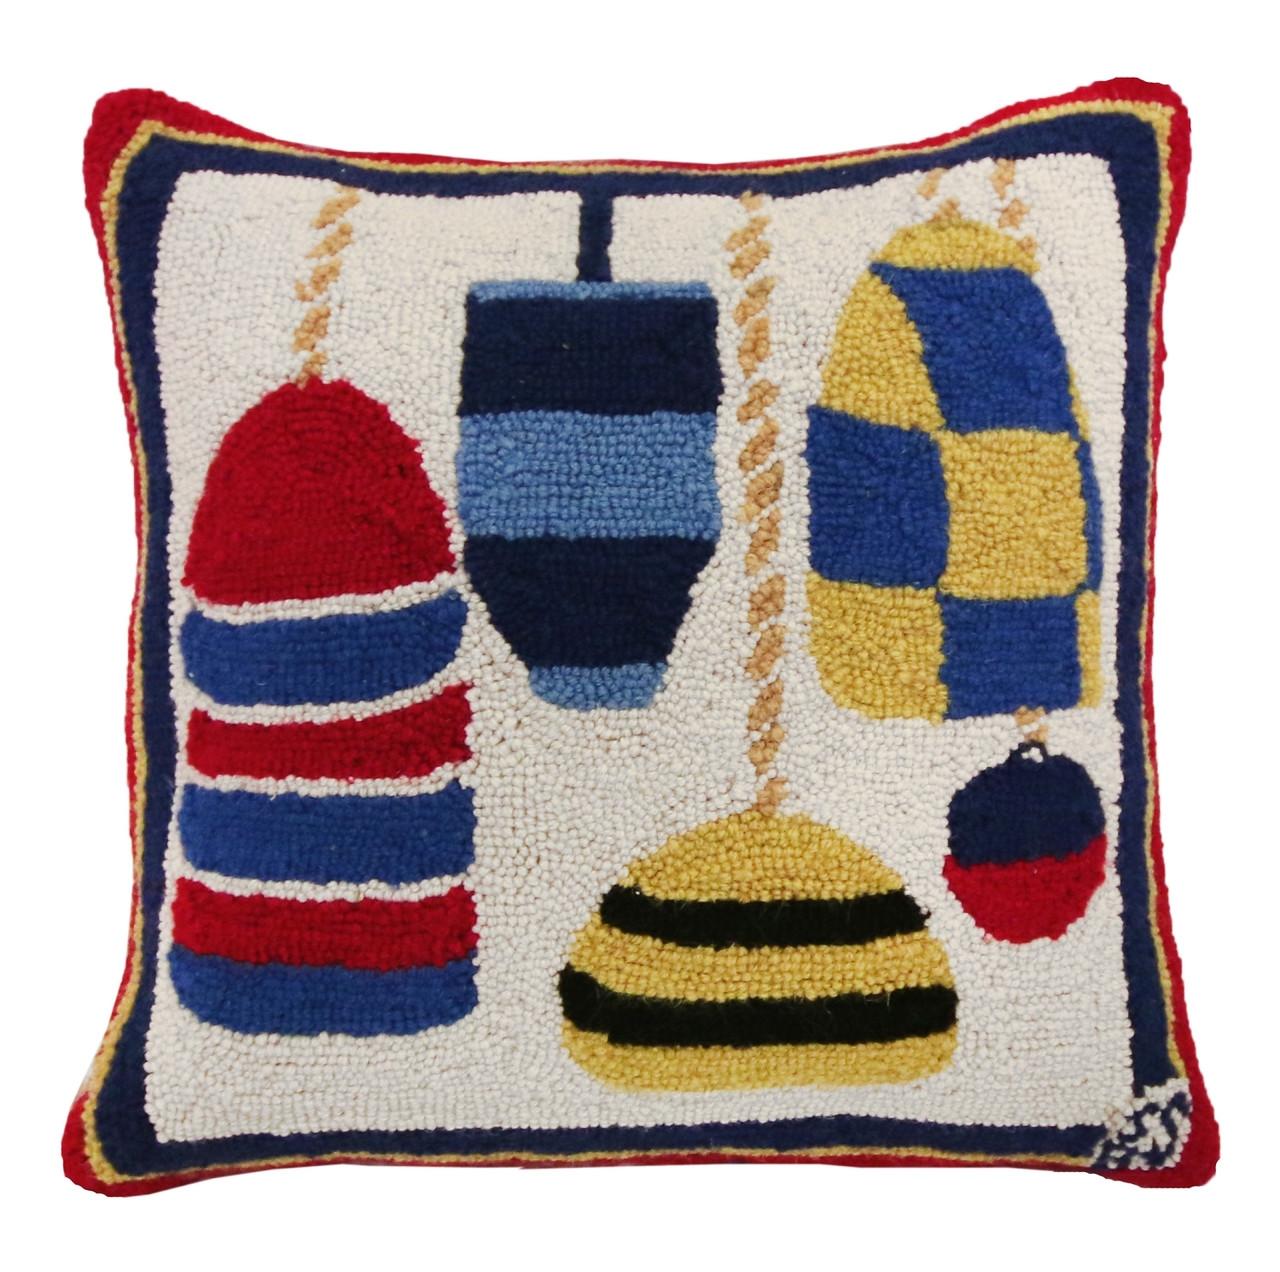 Buoys Hooked Pillow